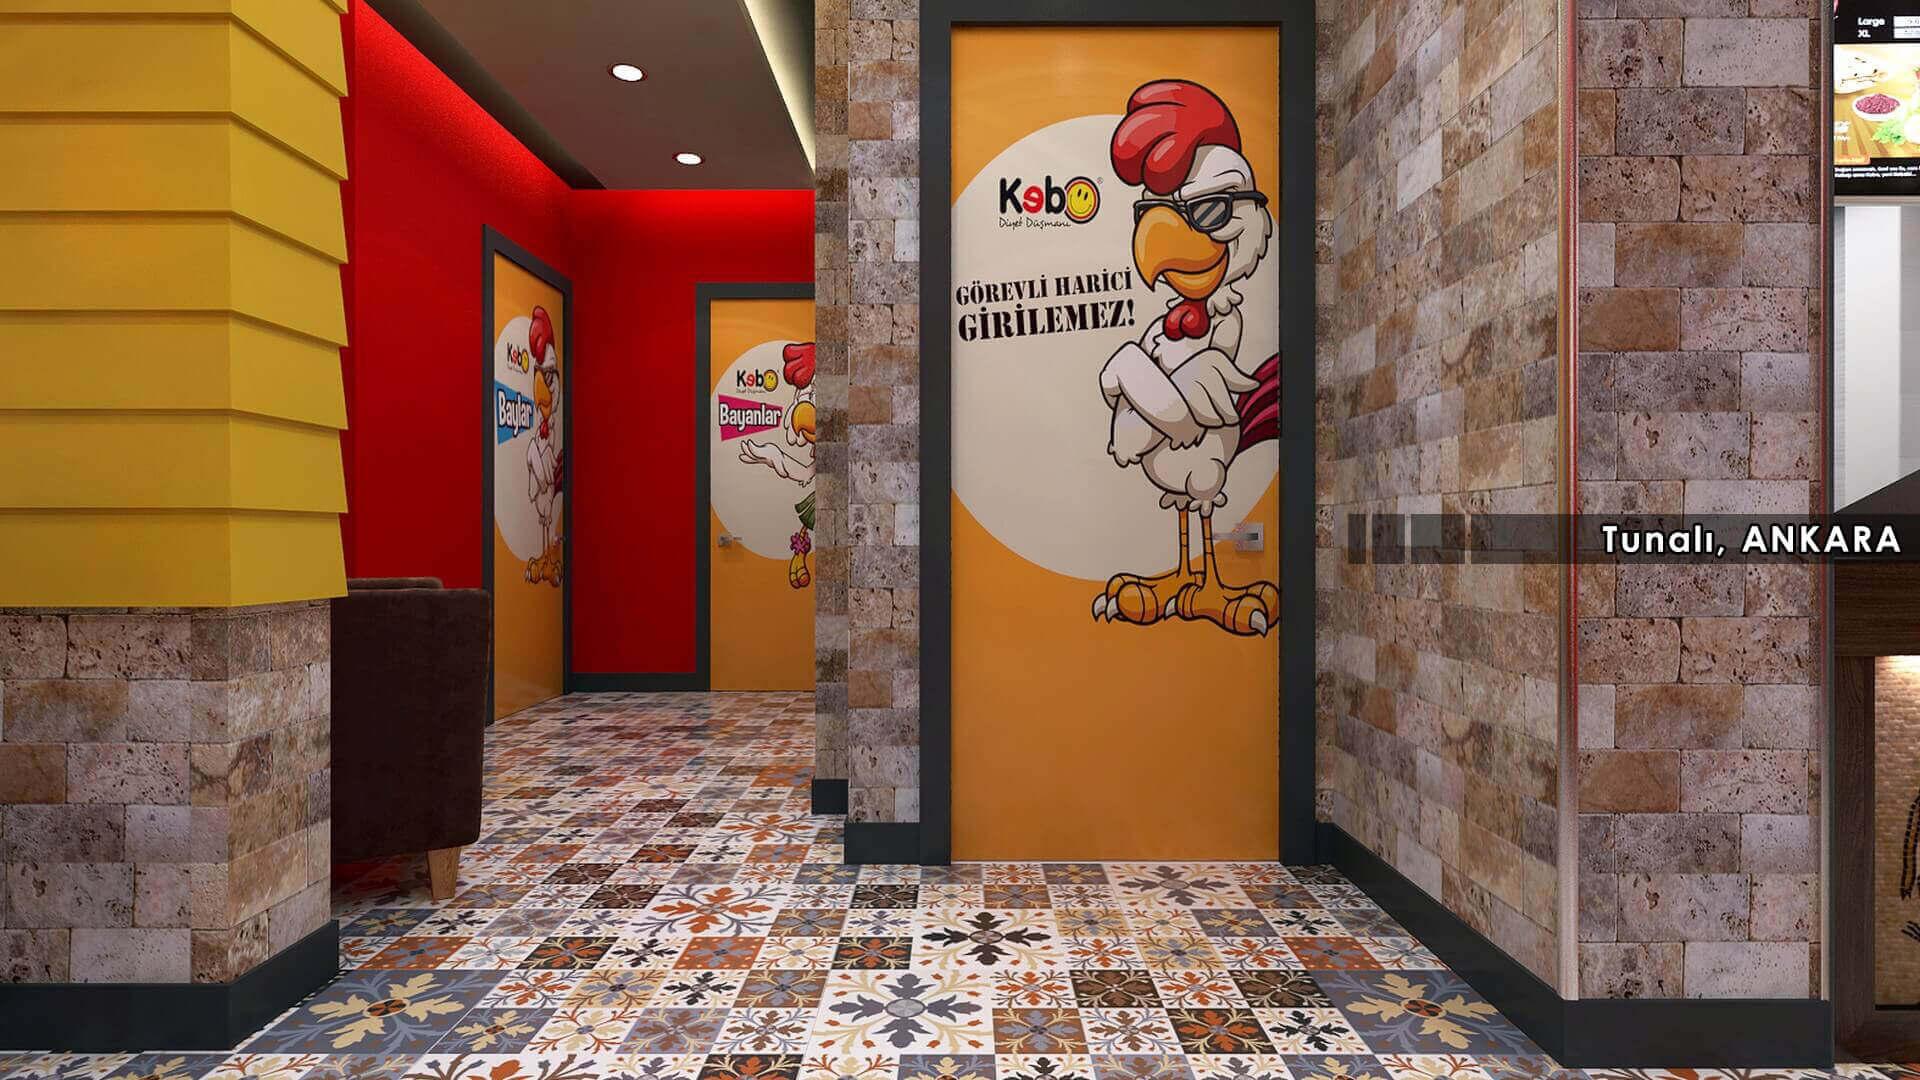 restoran tasarımı 2110 Kebo 2016 Restoranlar